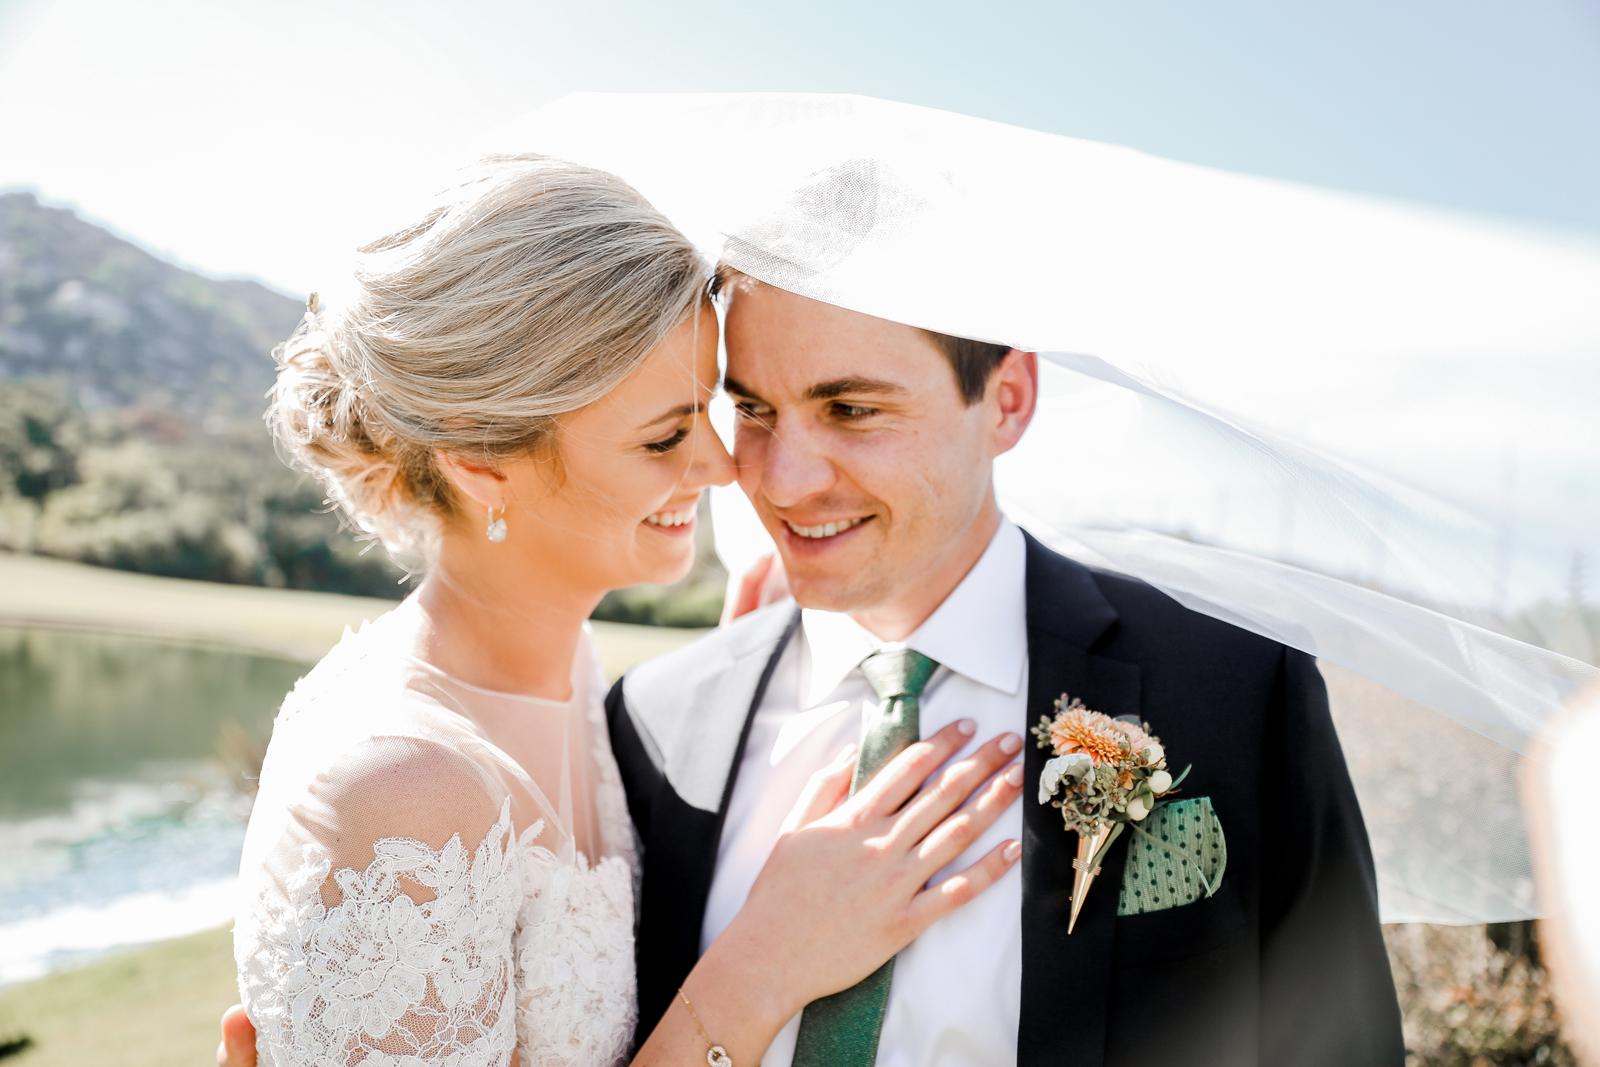 jade-and-tom-wedding-day-re-edit-49 copy.jpg